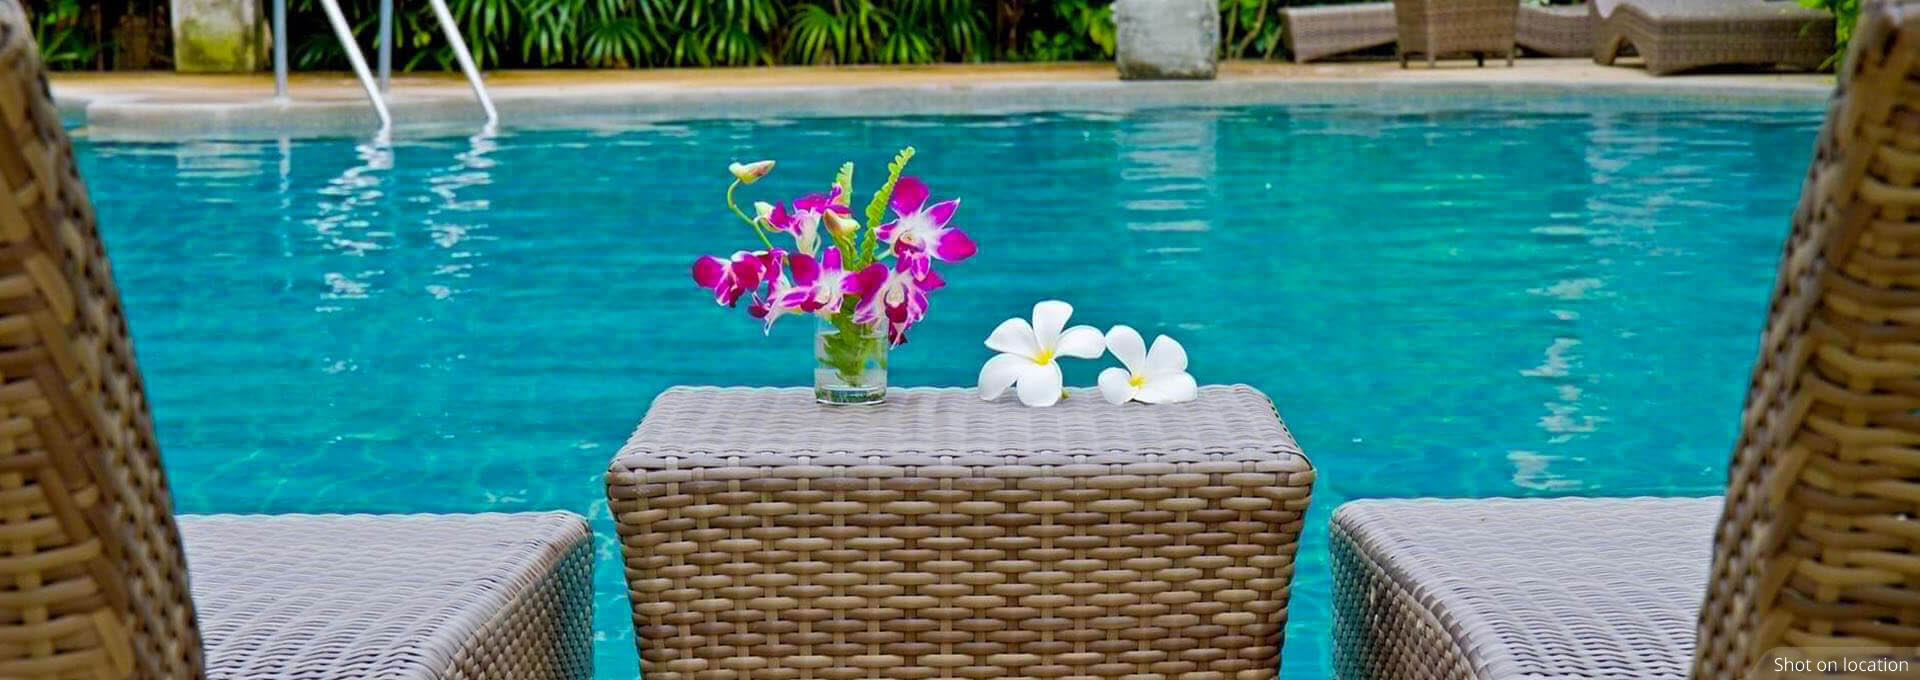 Swimming Pool in Crossgate by House of Hiranandani in Devanahalli, Bengaluru